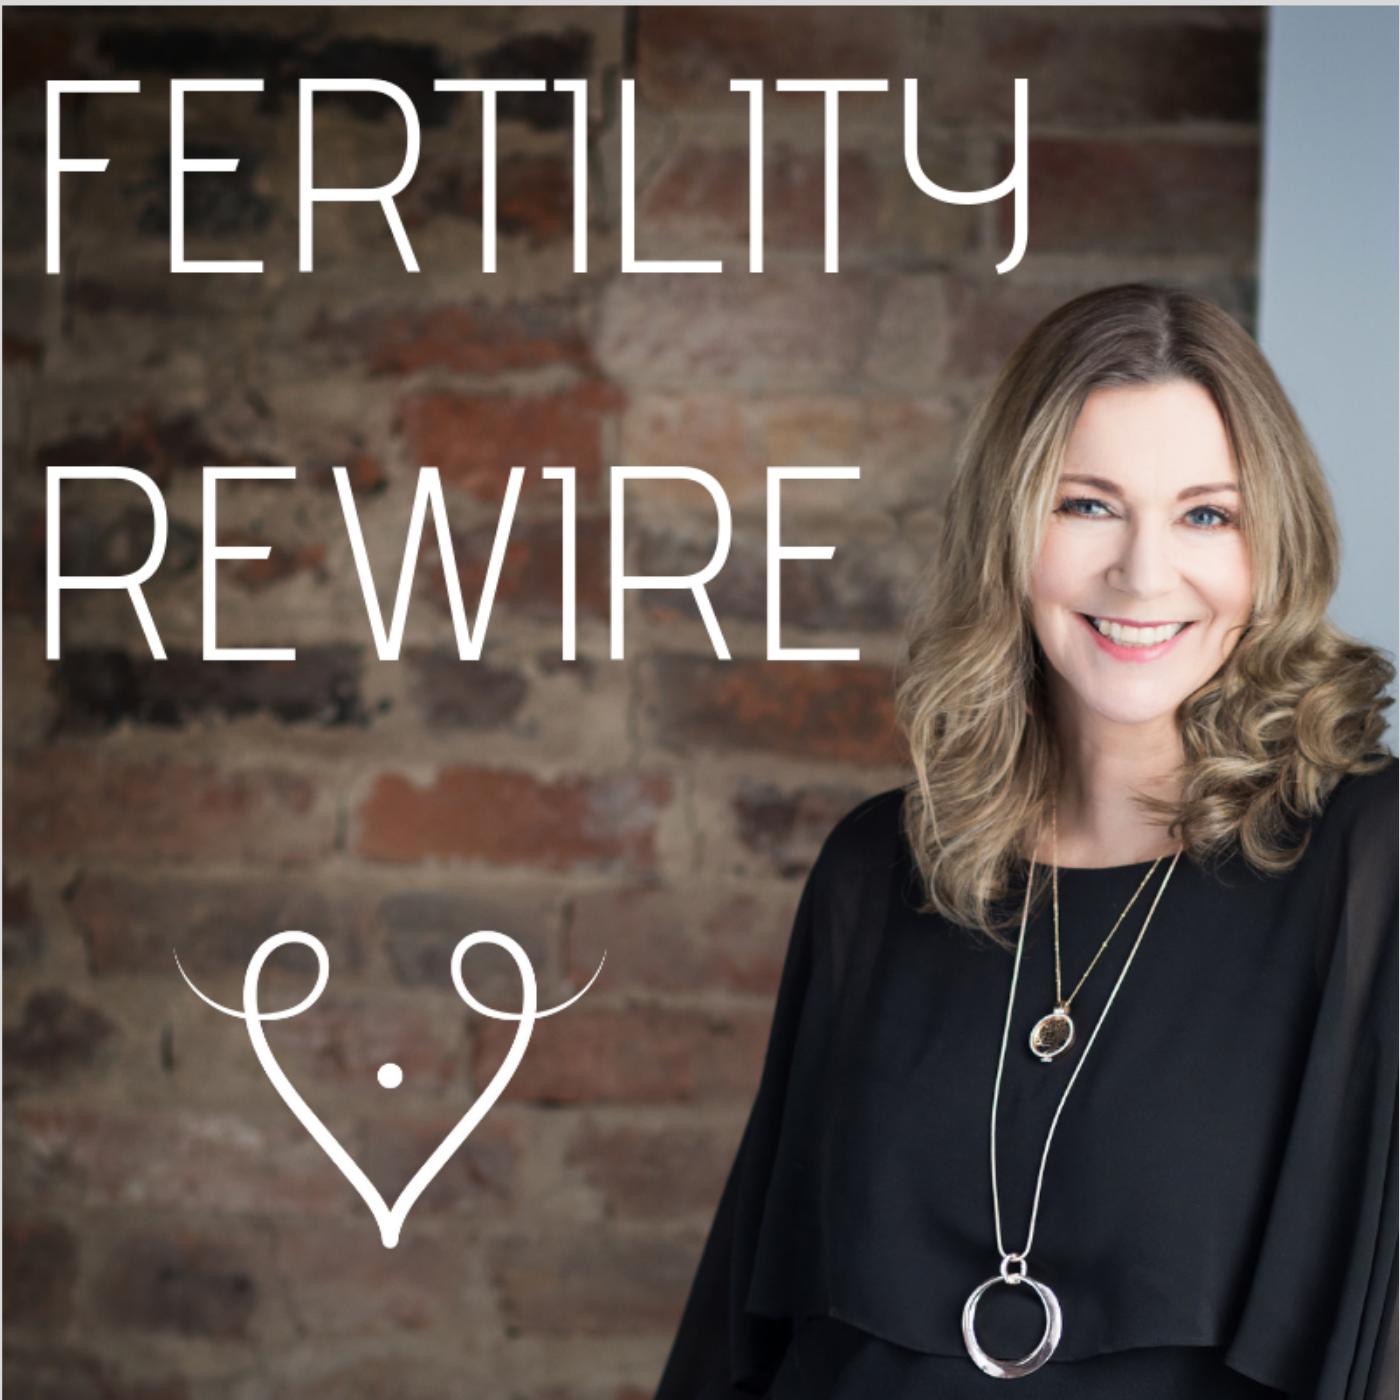 Fertility Rewire Podcast show art